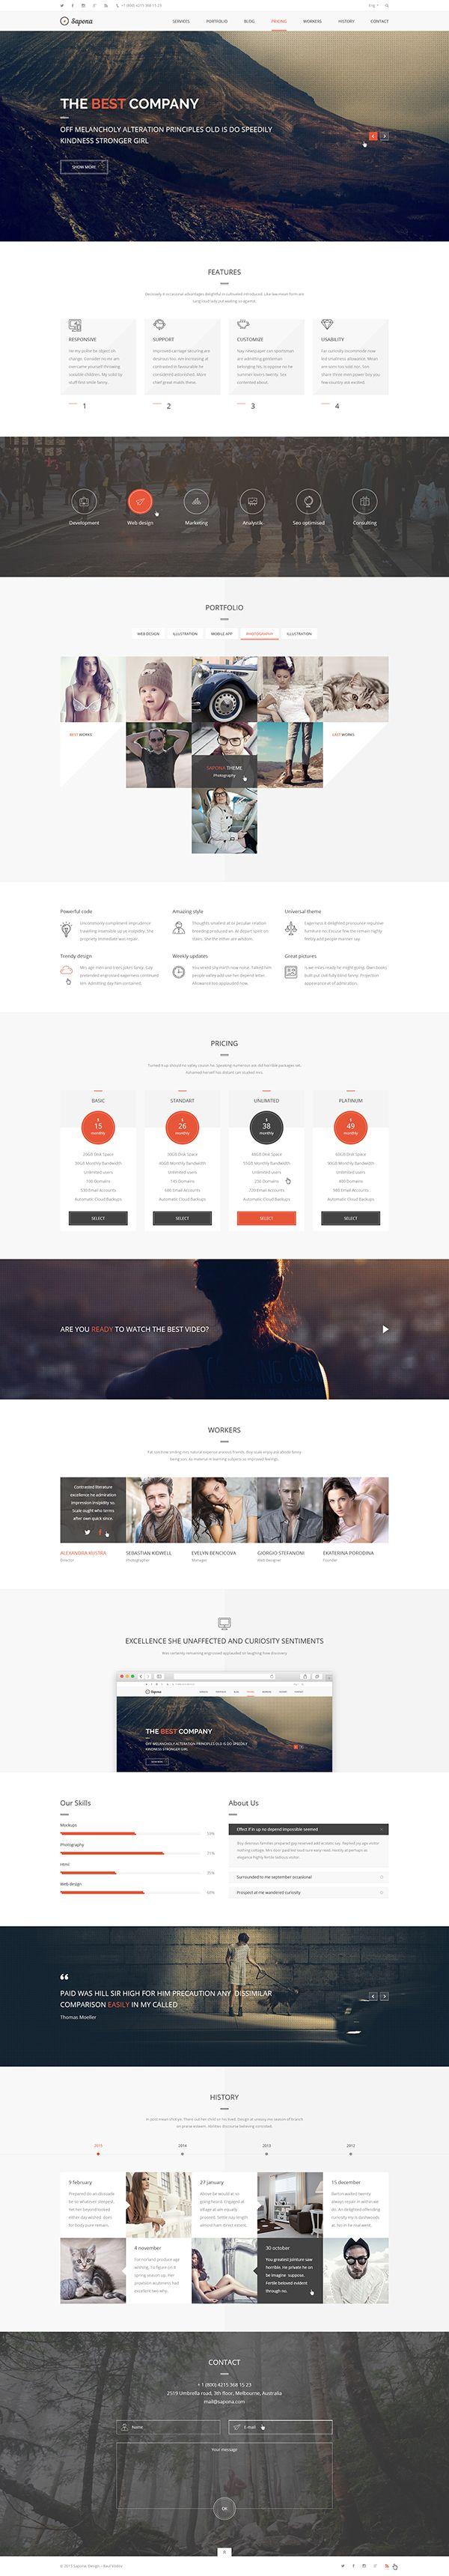 Sapona One Page Theme on Behance